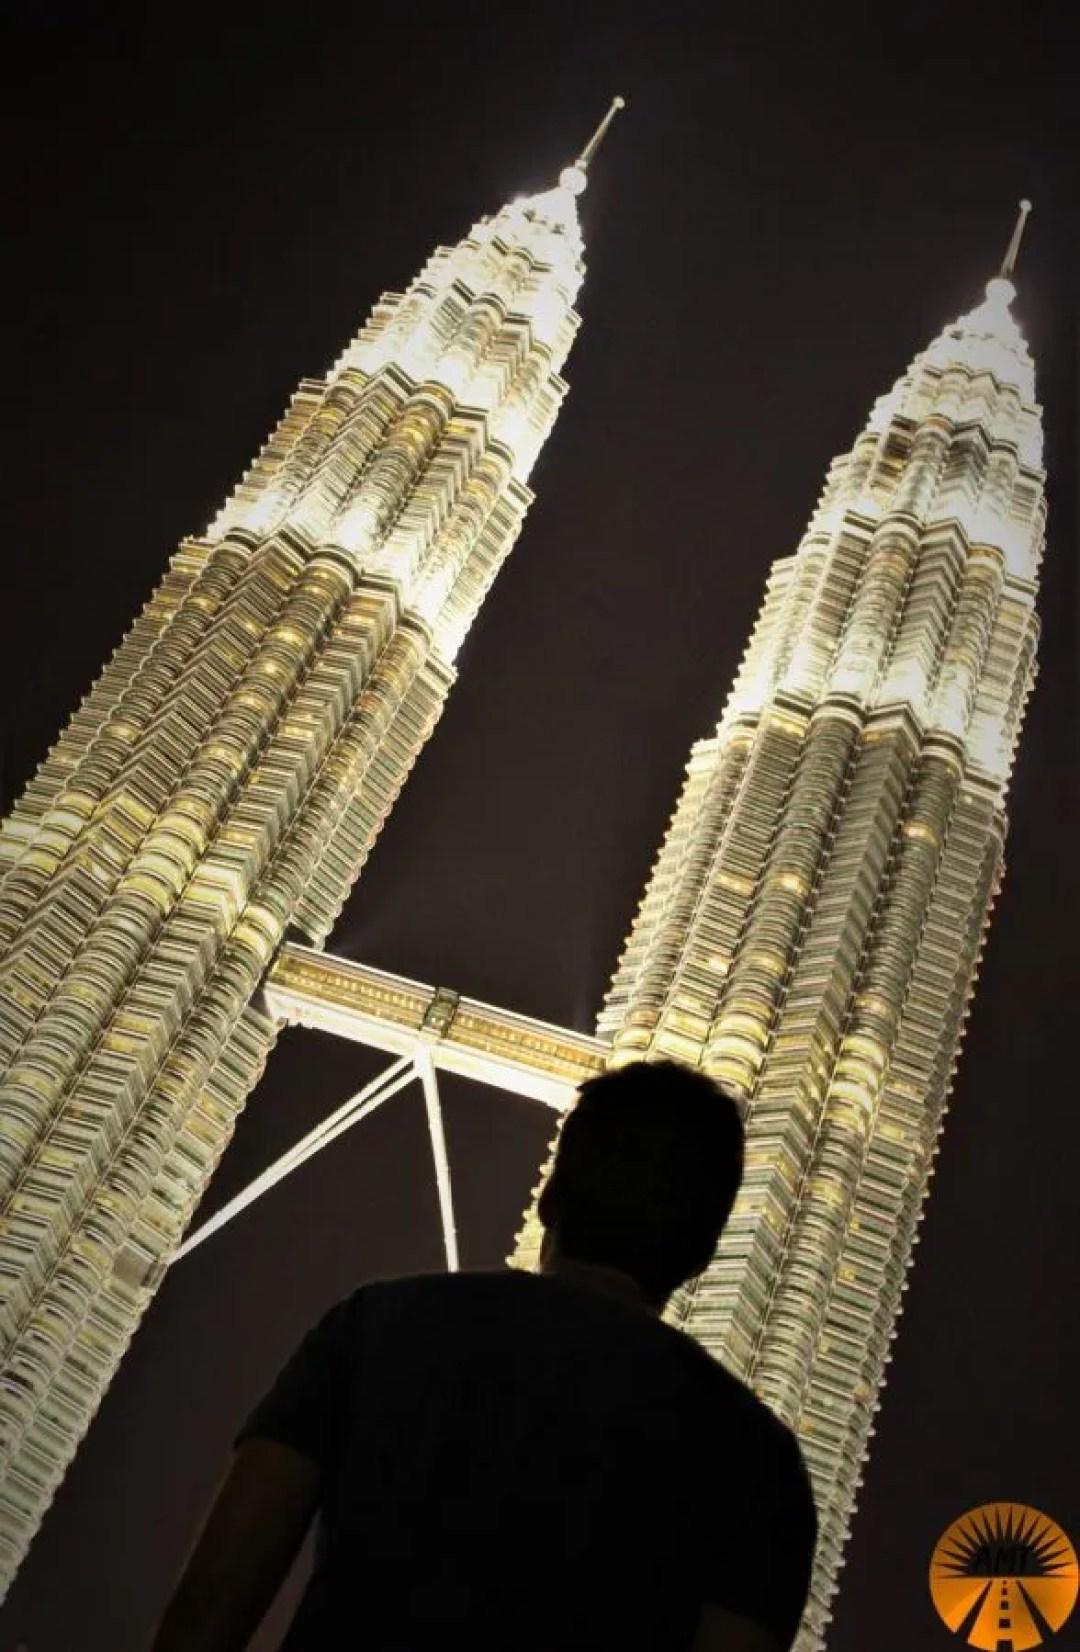 Petronas Towers di notte, Kuala Lumpur, Malesia